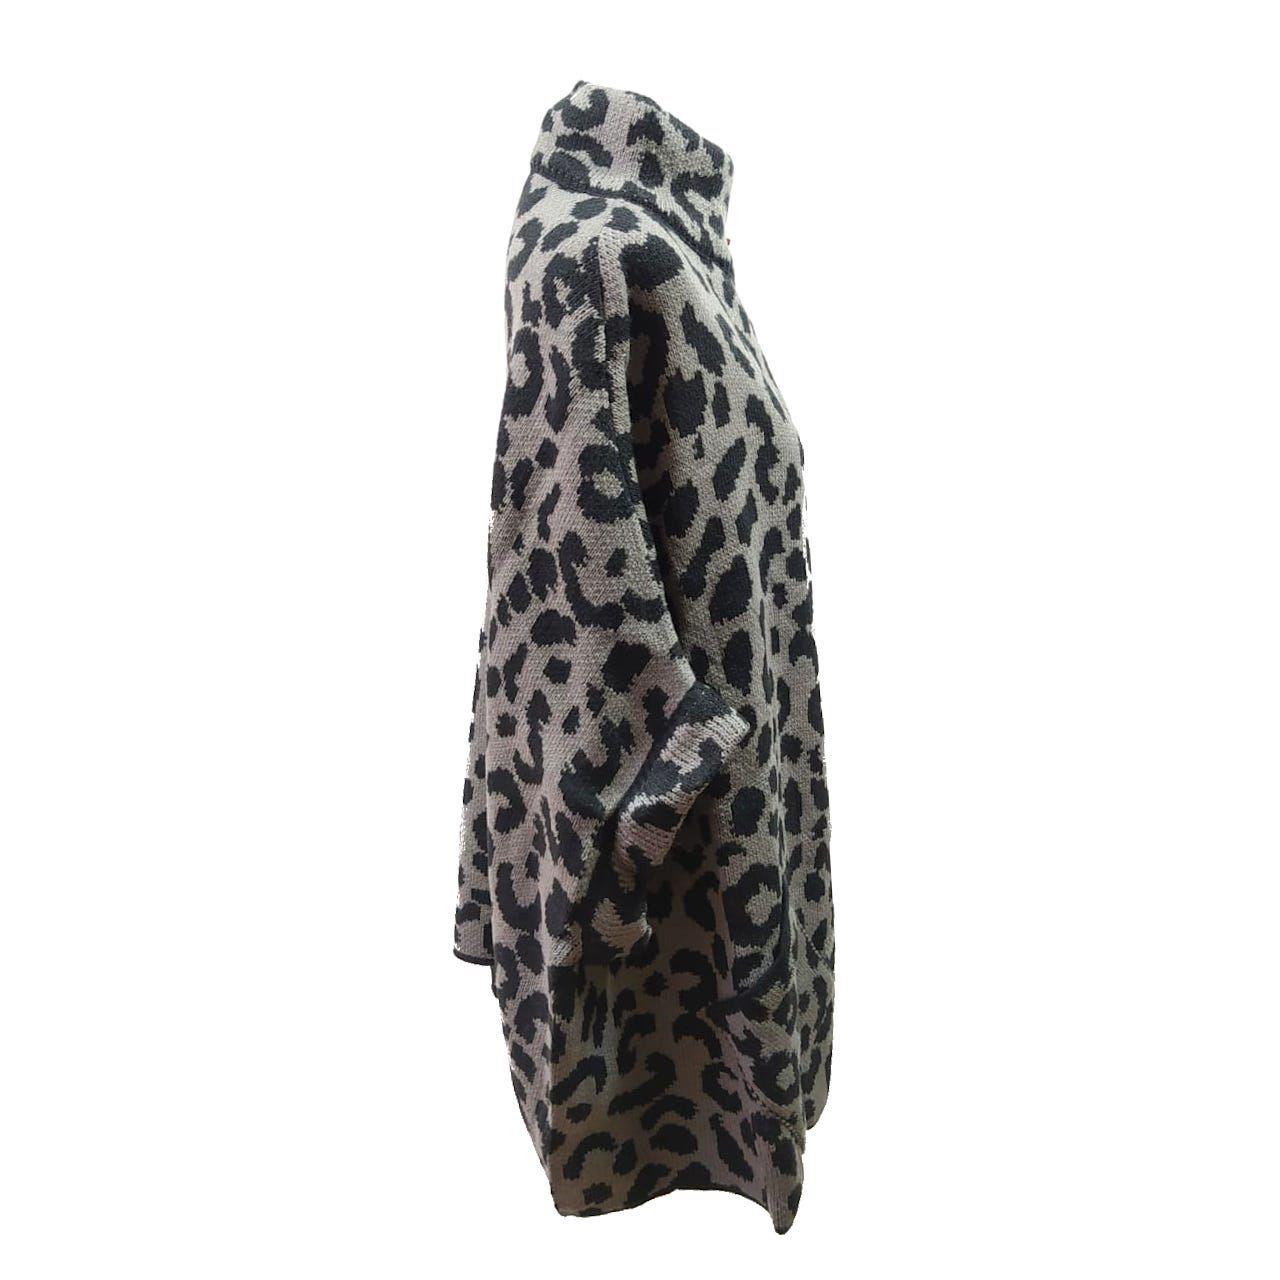 Poncho Feminino Animal Print REF:20538